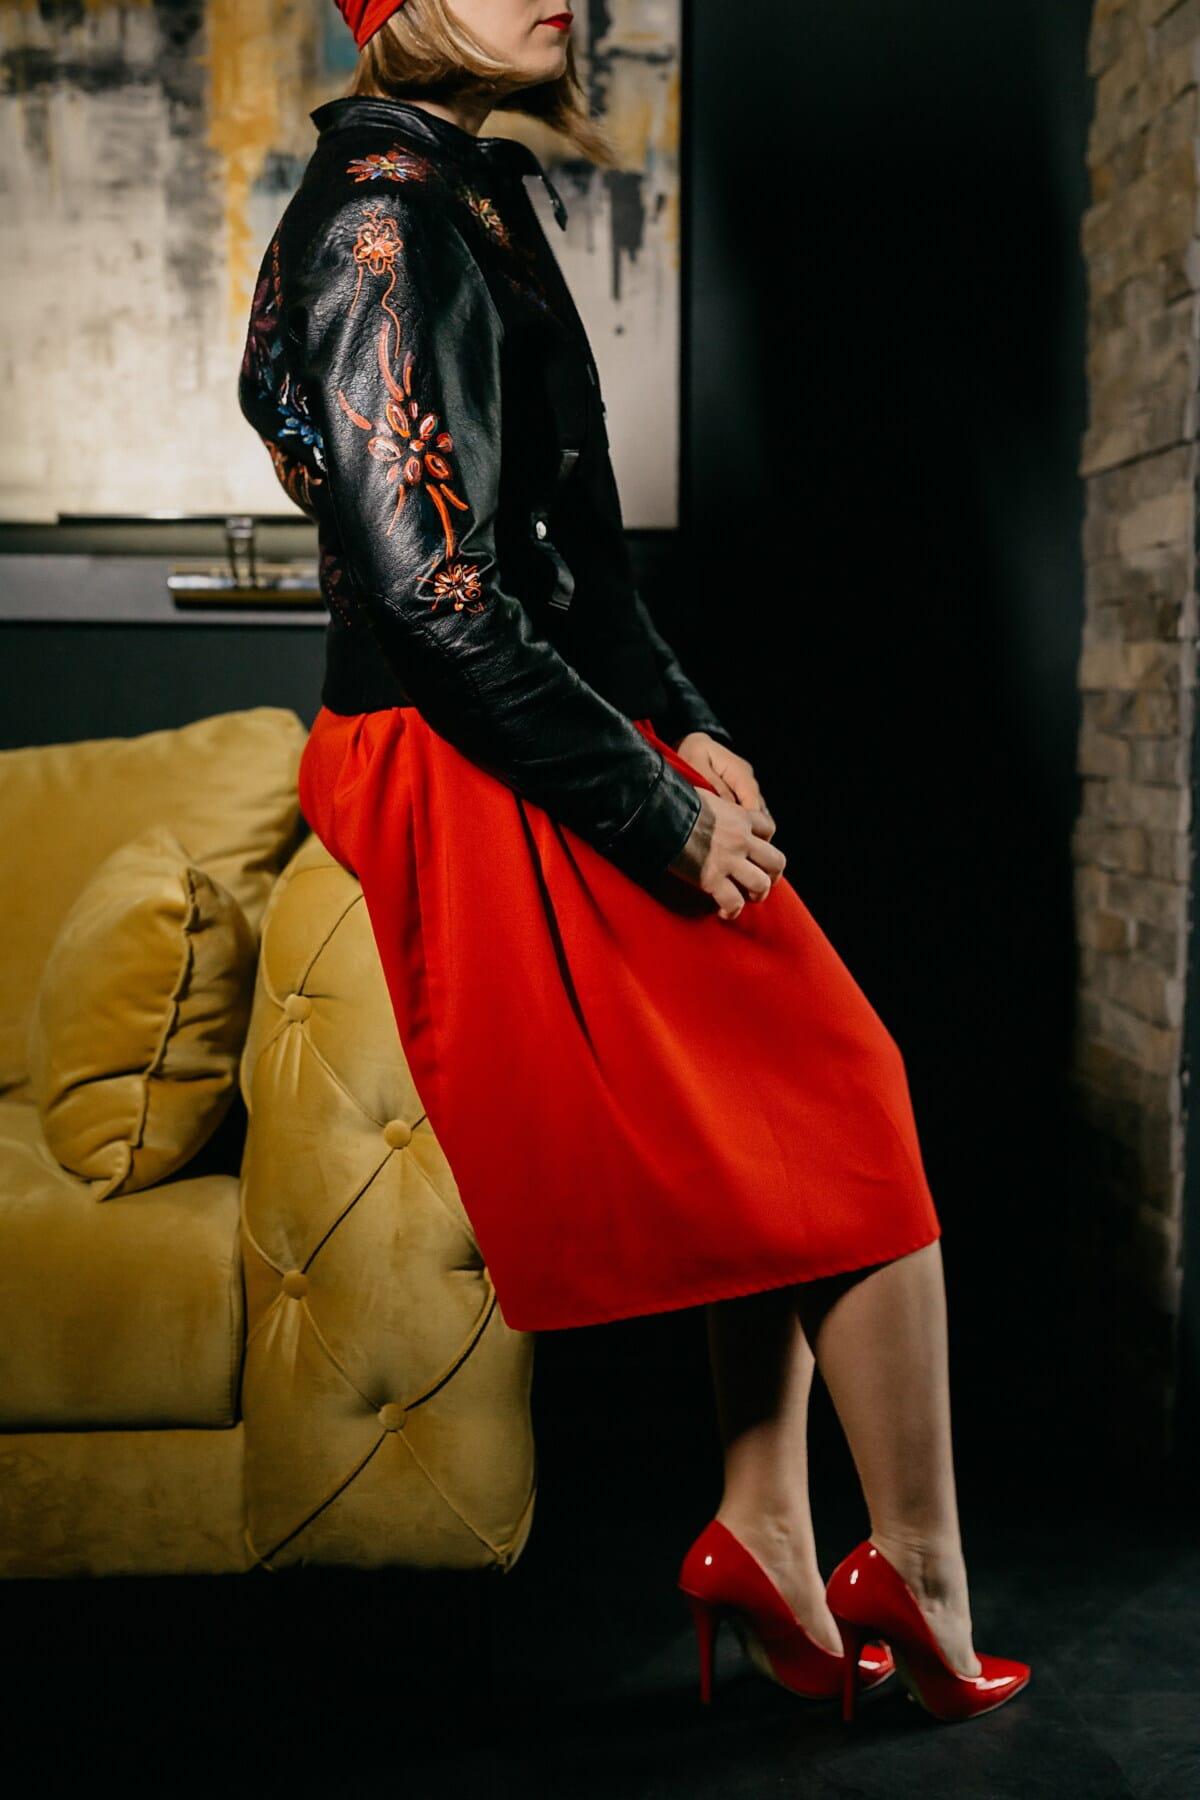 negro, de lujo, moda, chaqueta, mujer joven, cuero, moda, hecho a mano, mujer, modelo